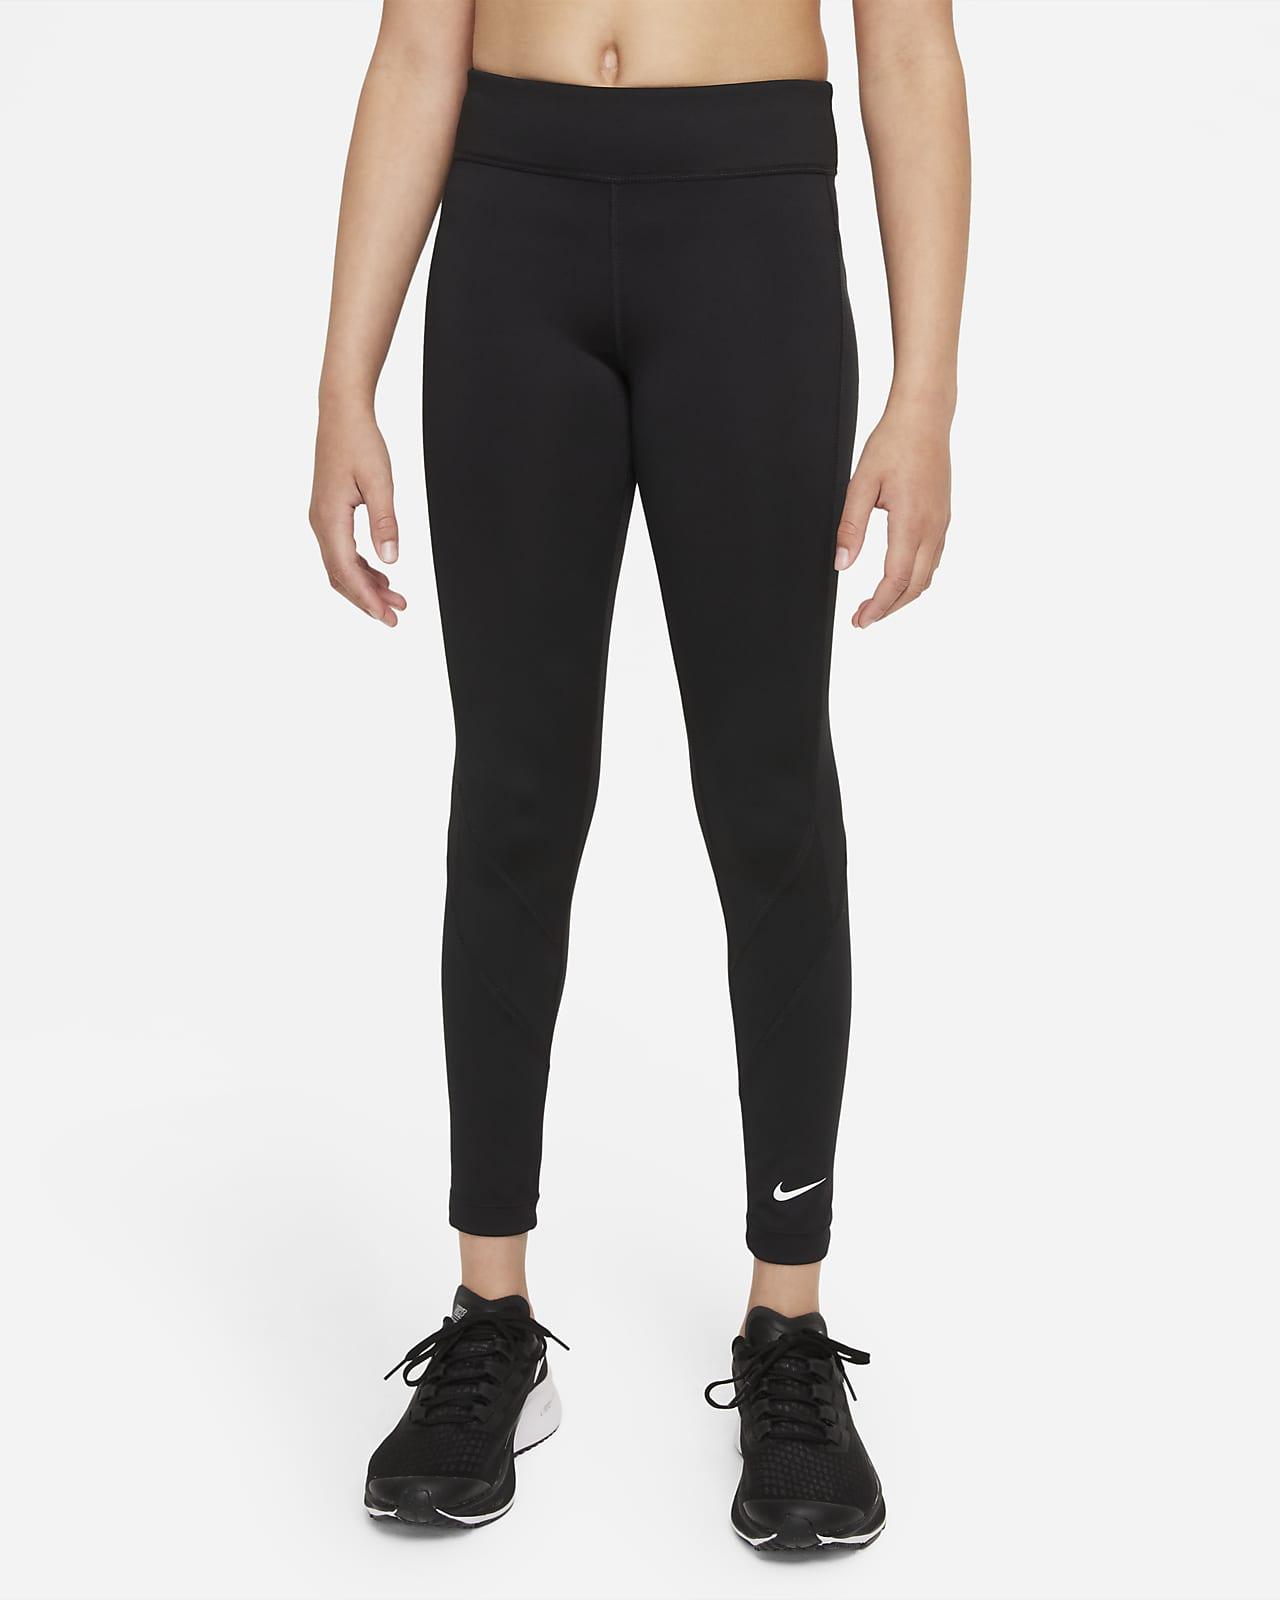 Nike Dri-FIT One Older Kids' (Girls') Leggings